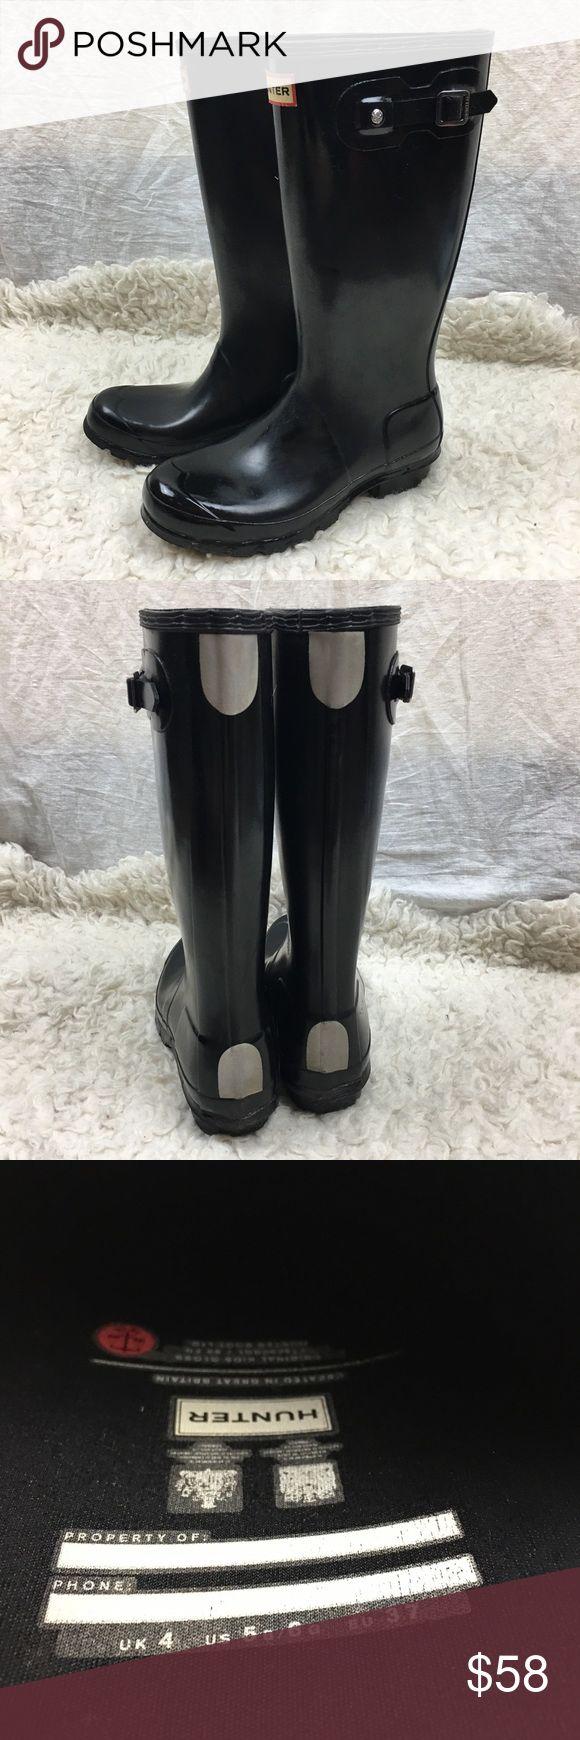 Hunter huntress black glossy rubber rain boots 6 Hunter Women's Black Glossy Rainboots - Waterproof Size EUR 37 / US 6 Hunter Boots Shoes Winter & Rain Boots